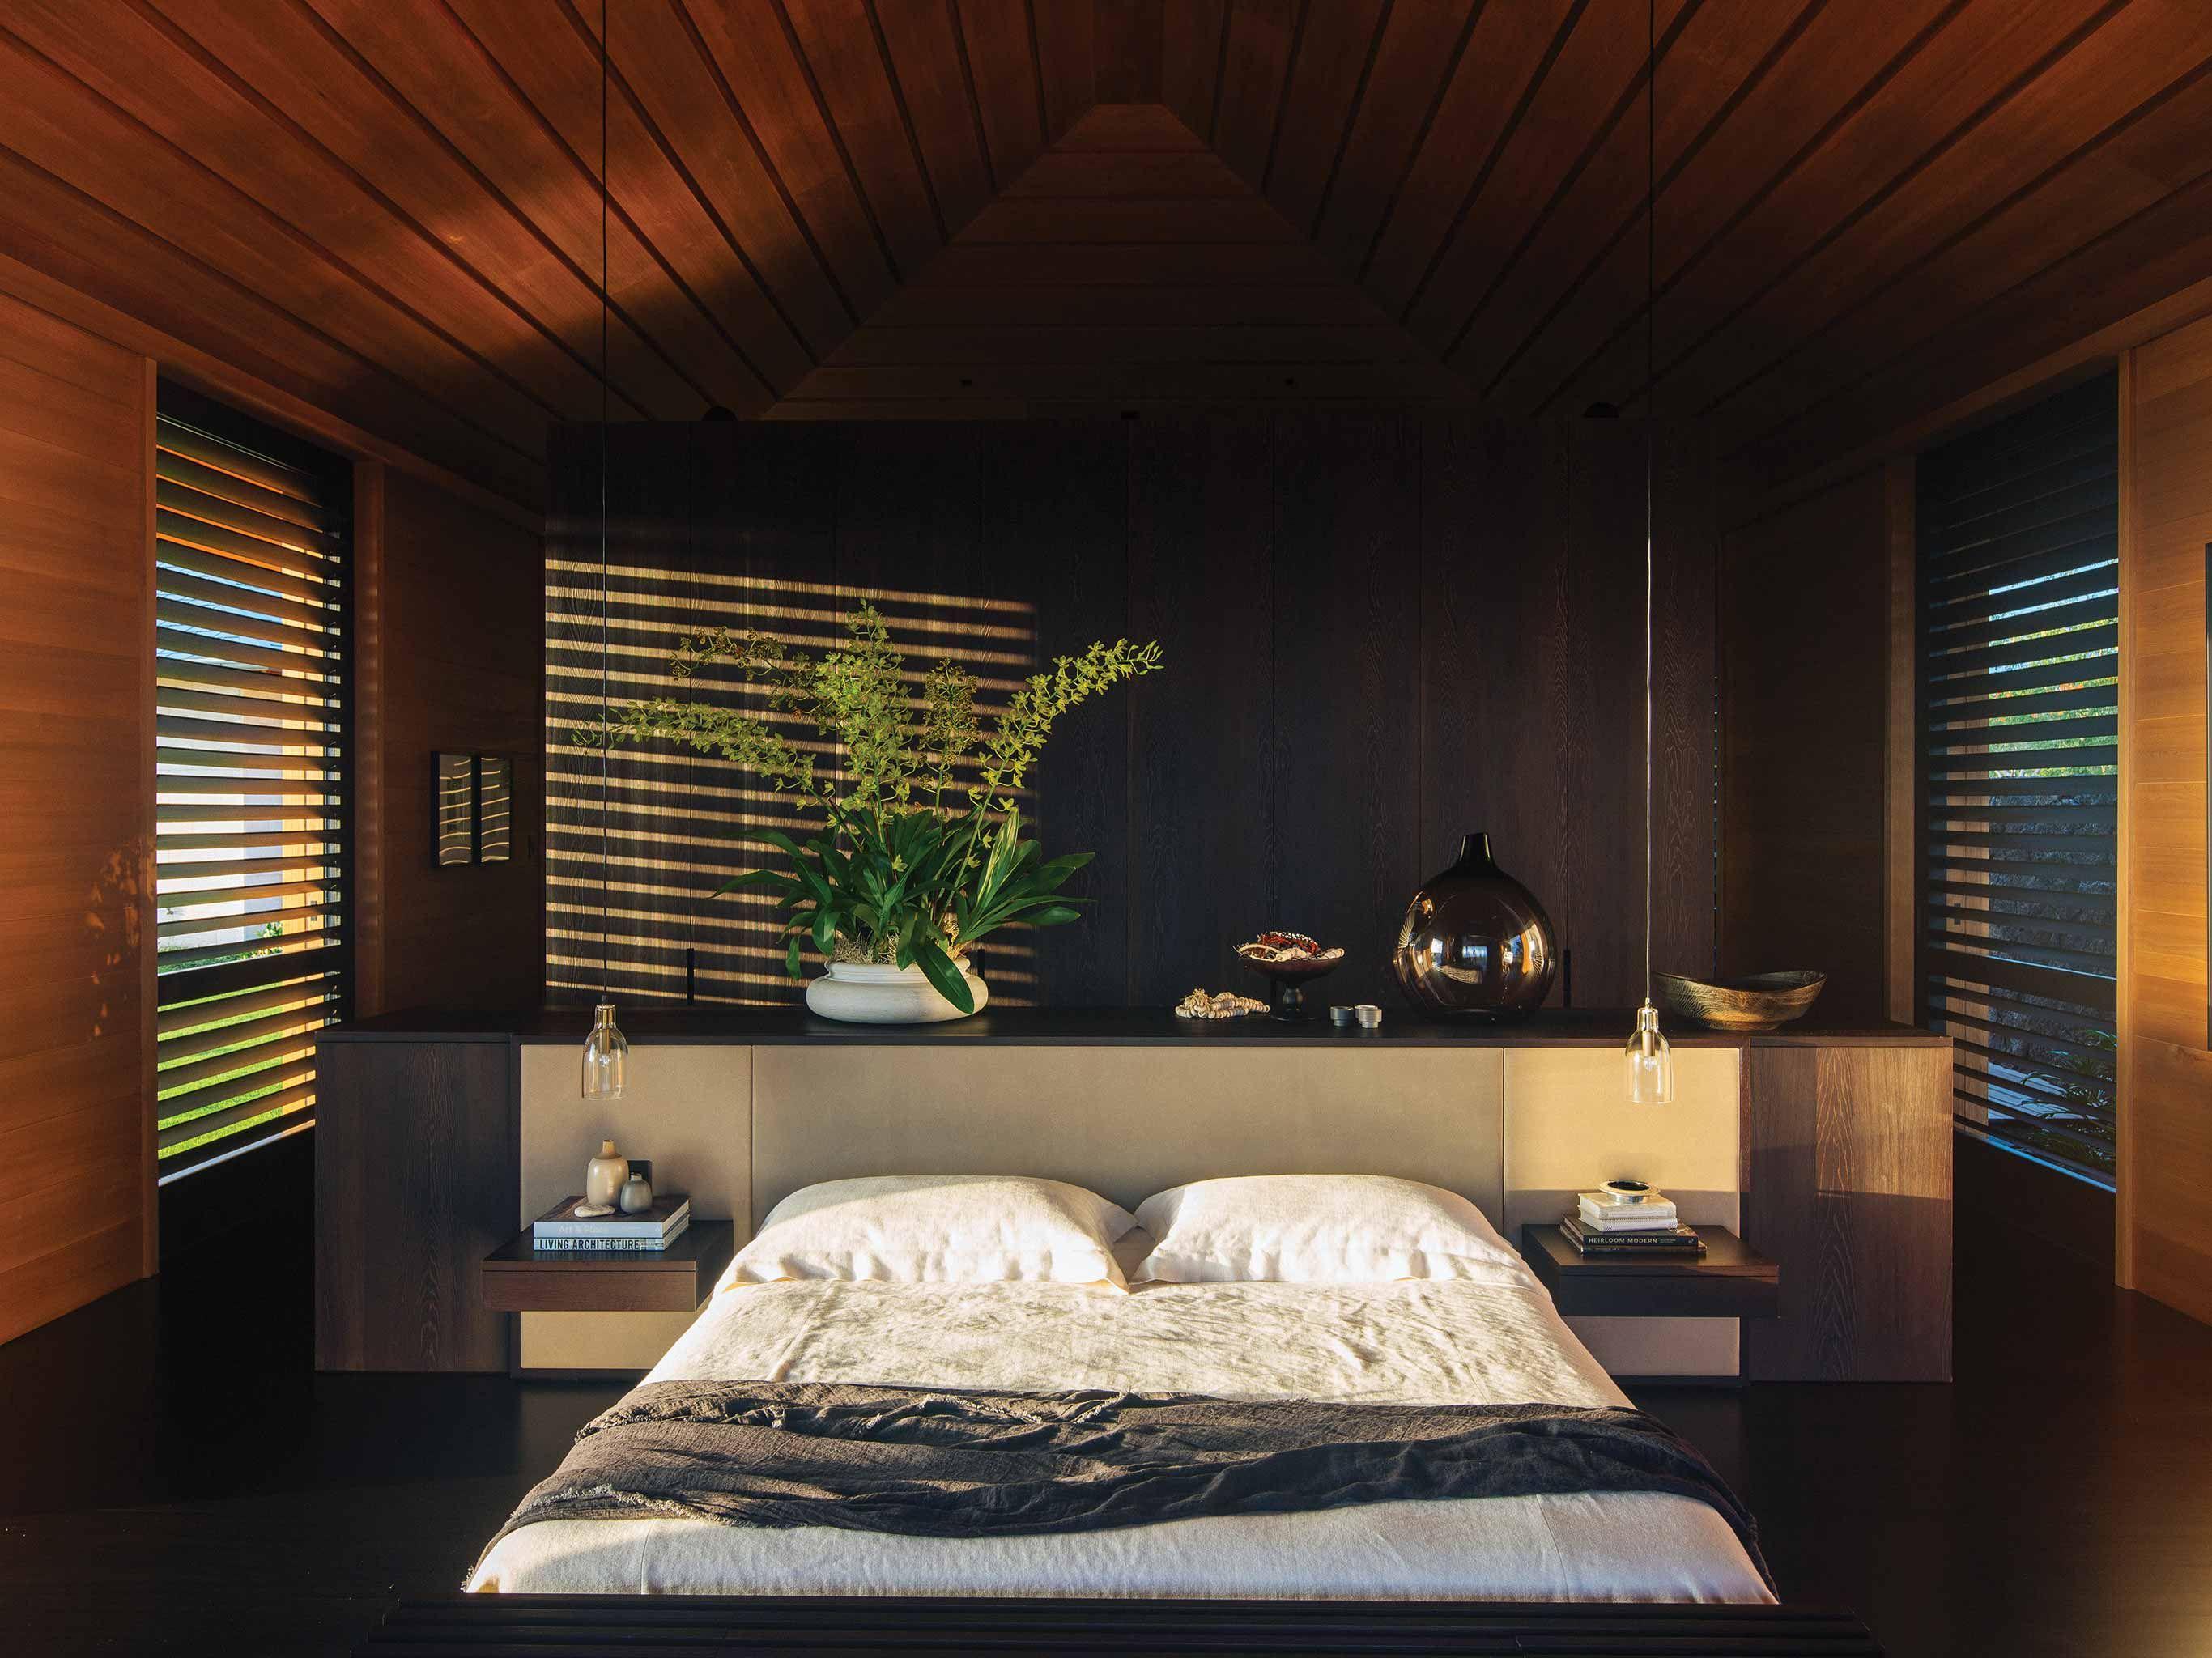 07 nicolehollis kona coast retreat hawaii bedroom t \\\\ home